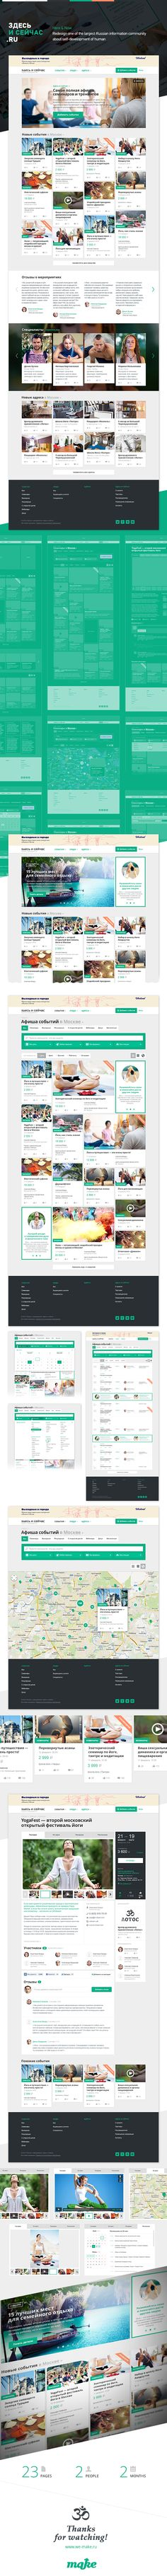 Here & Now by Paul Kolodyazhny, via Behance #webdesign #web #design